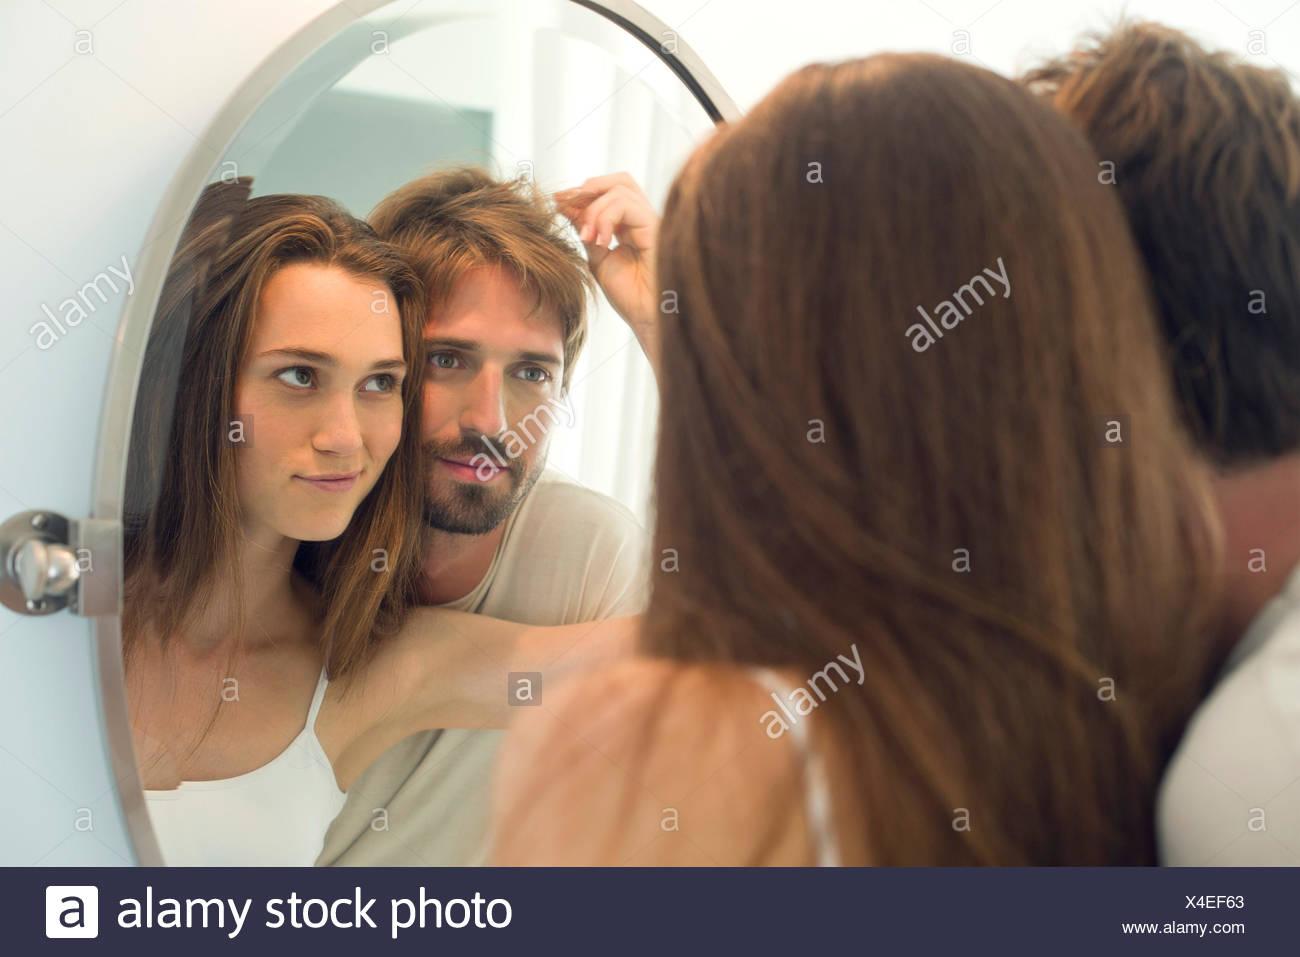 Coupe femme suggérant mari doit Photo Stock